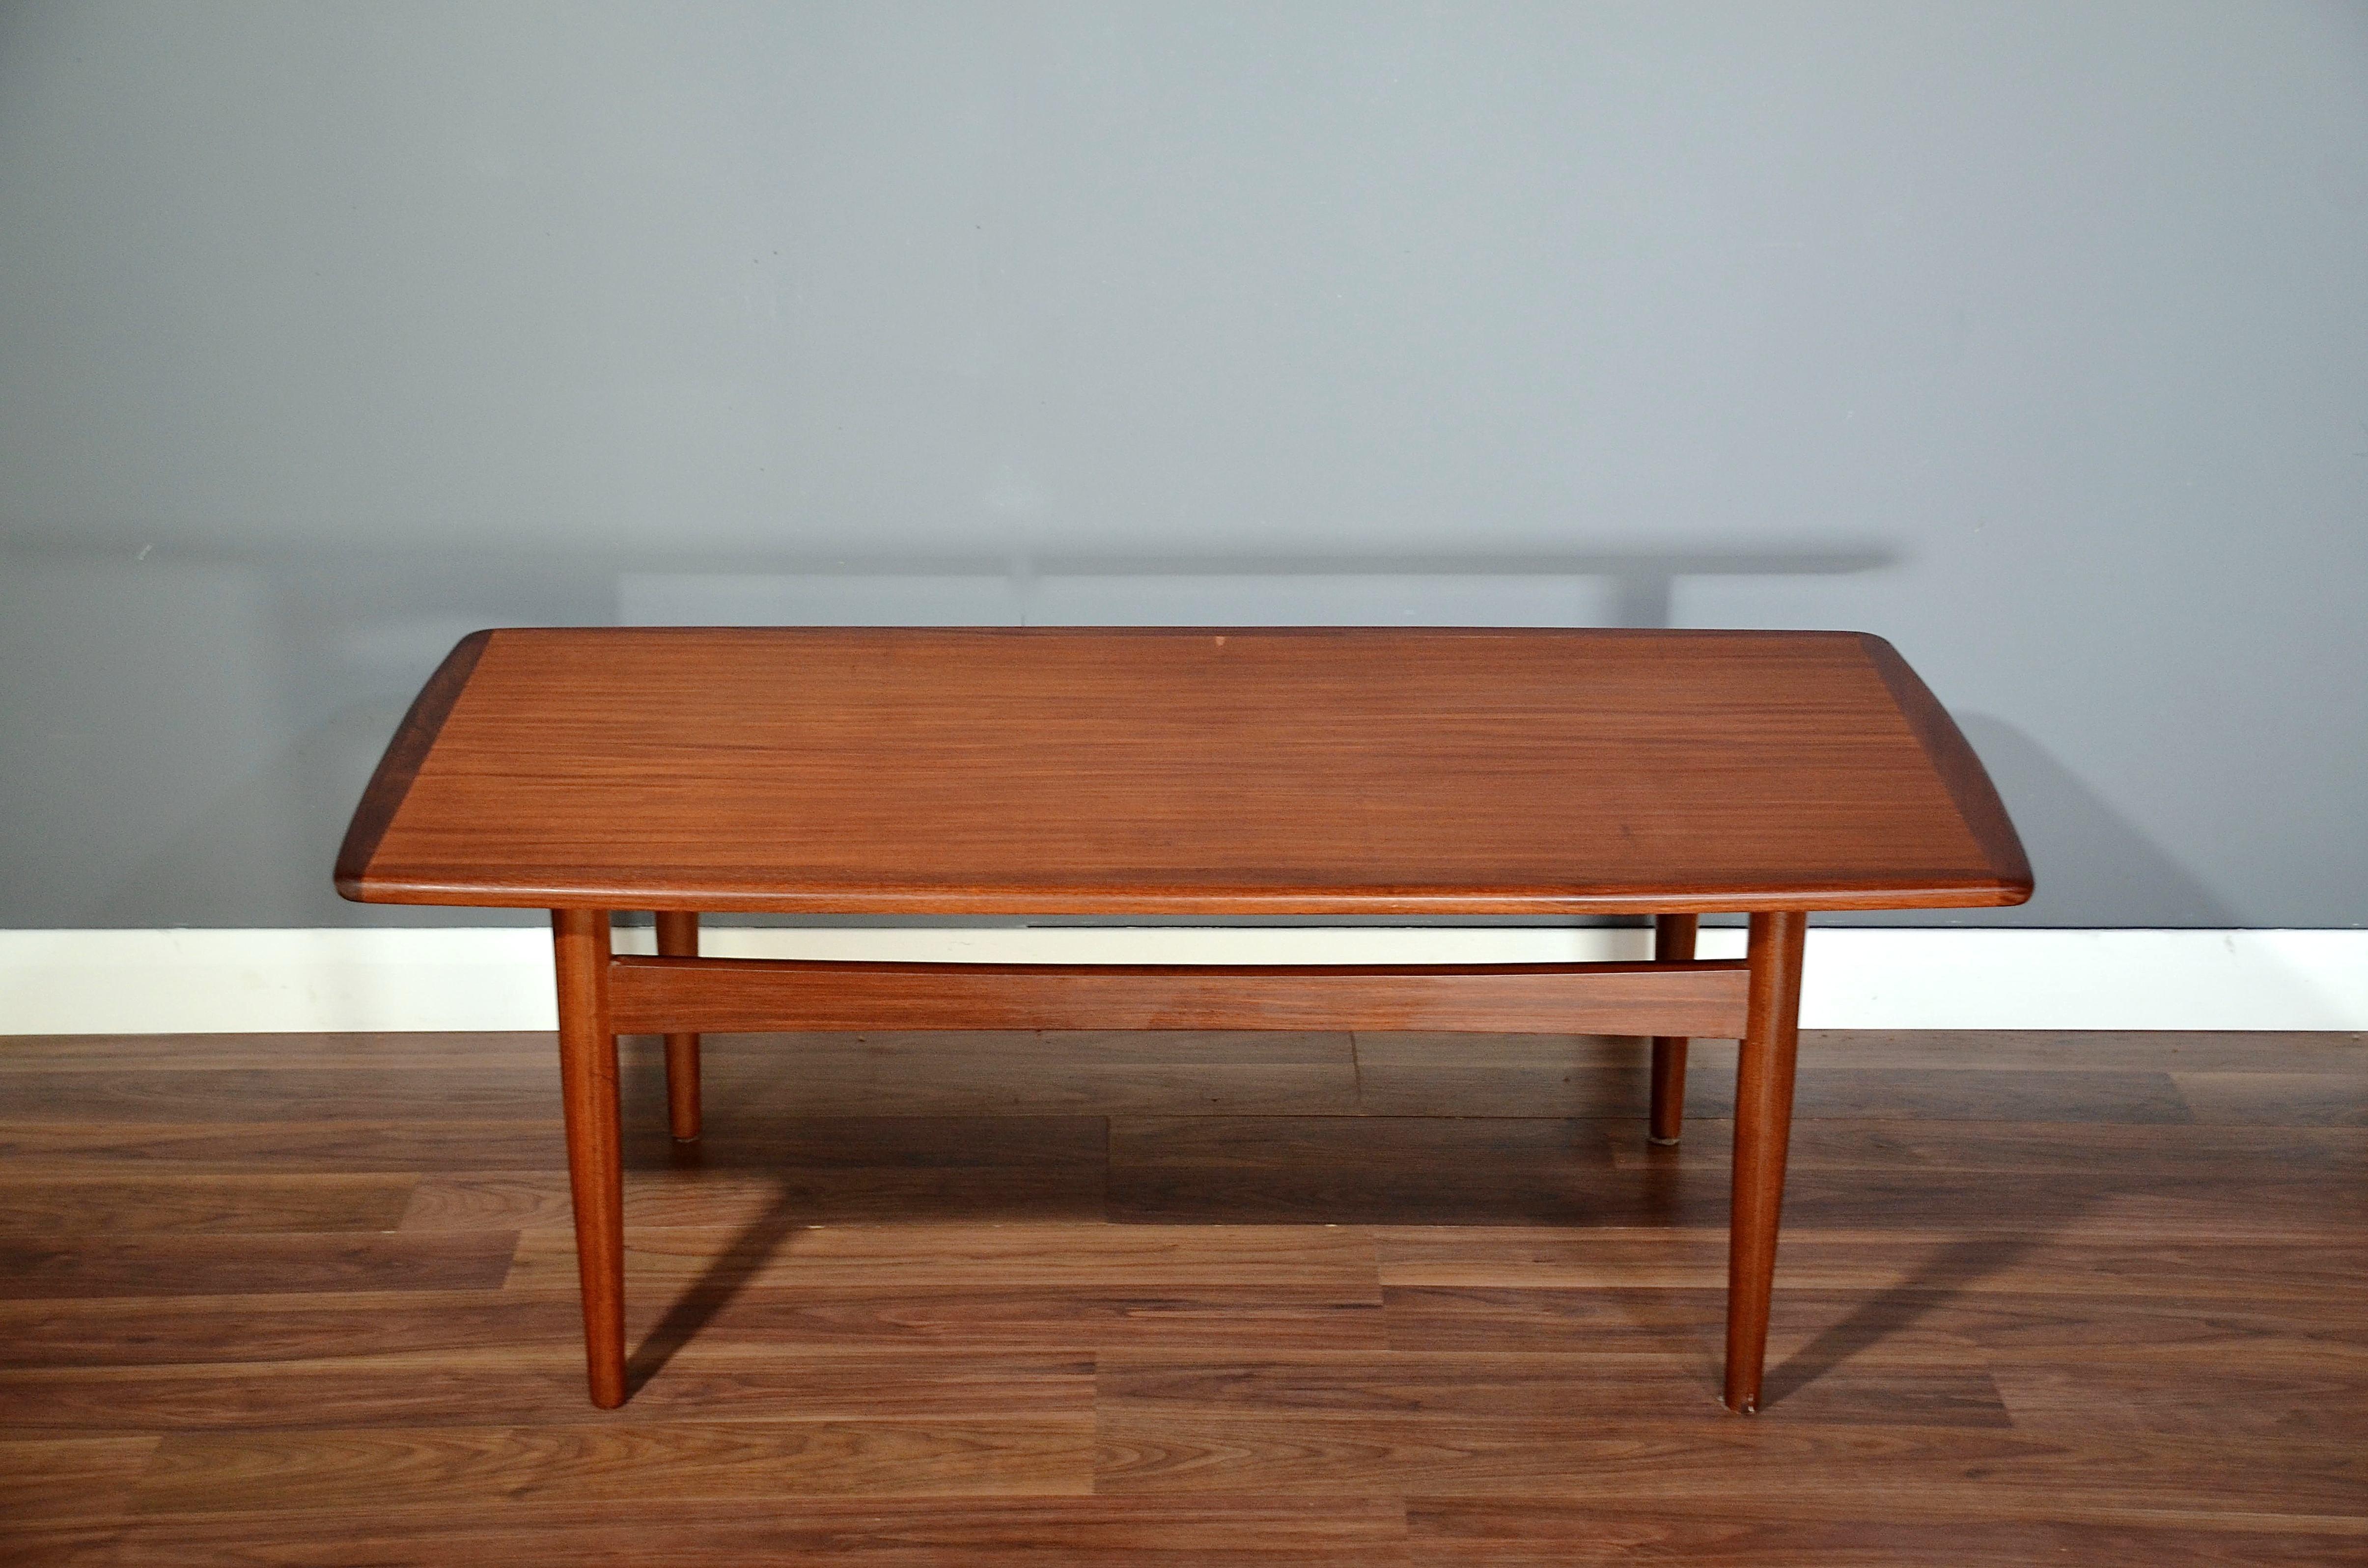 Vintage Teak Side Table.Vintage Danish Teak Coffee Table Delivery Modern Midcentury Retro